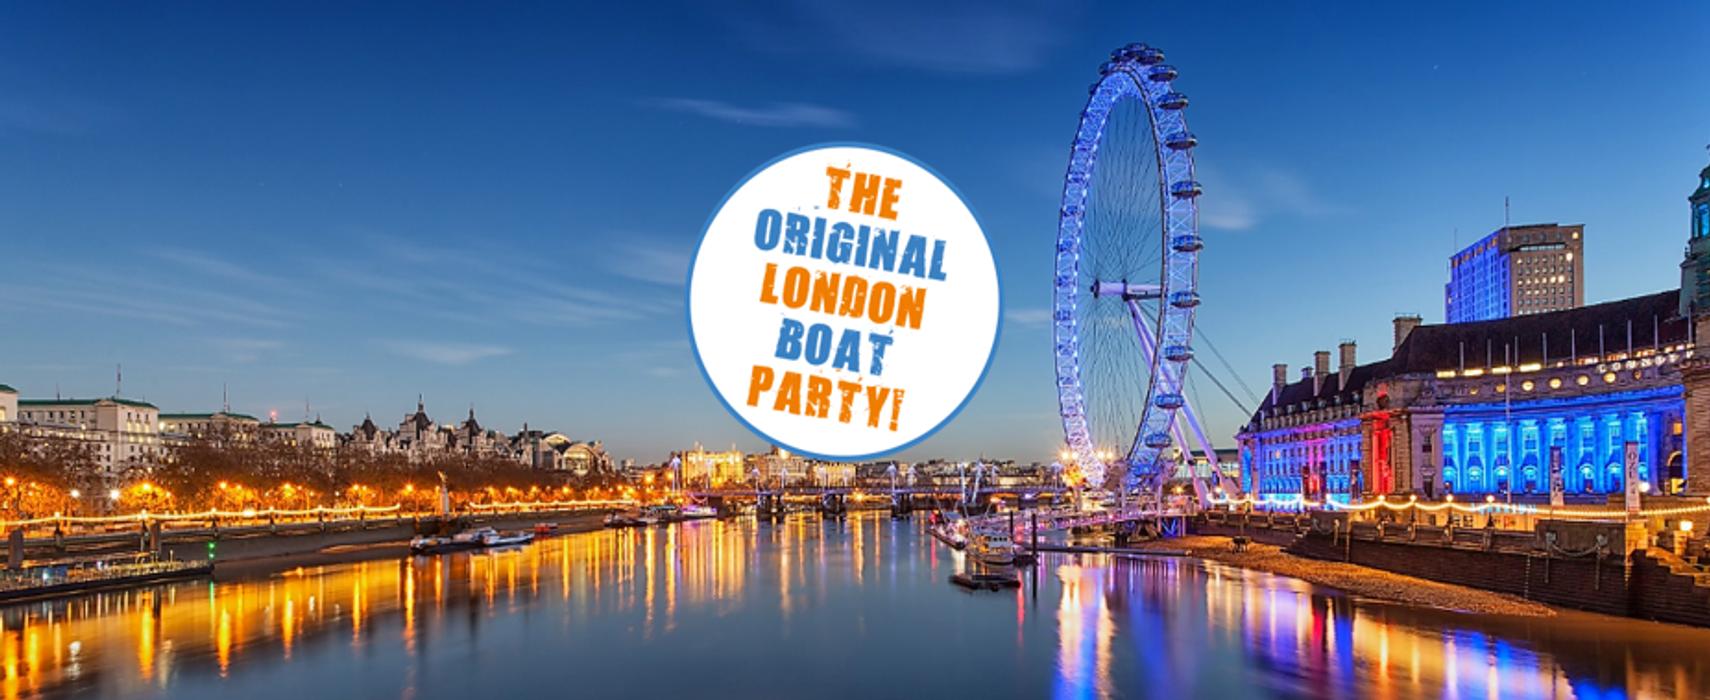 London's ORIGINAL boat party's event image